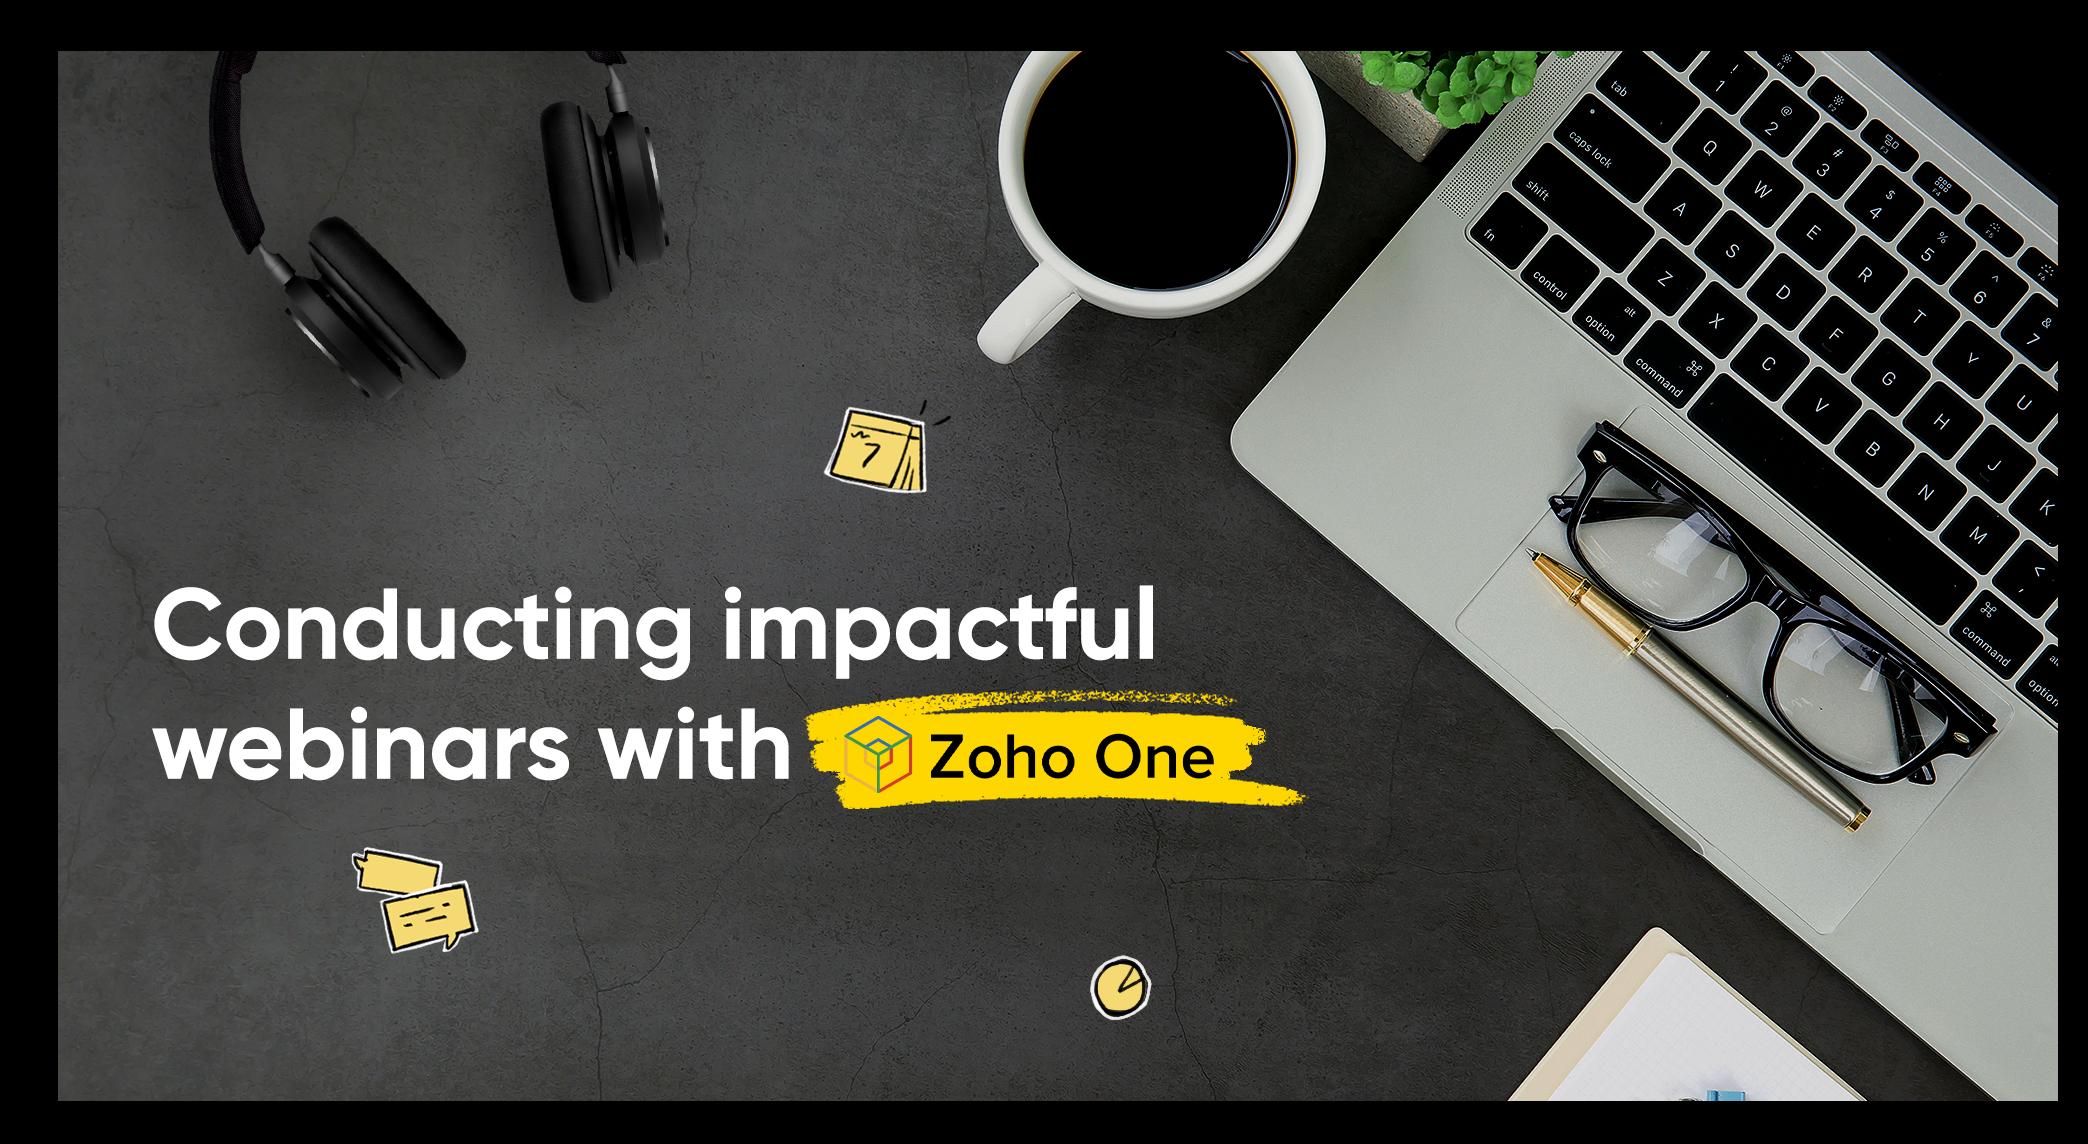 Conducting impactful webinars with Zoho One